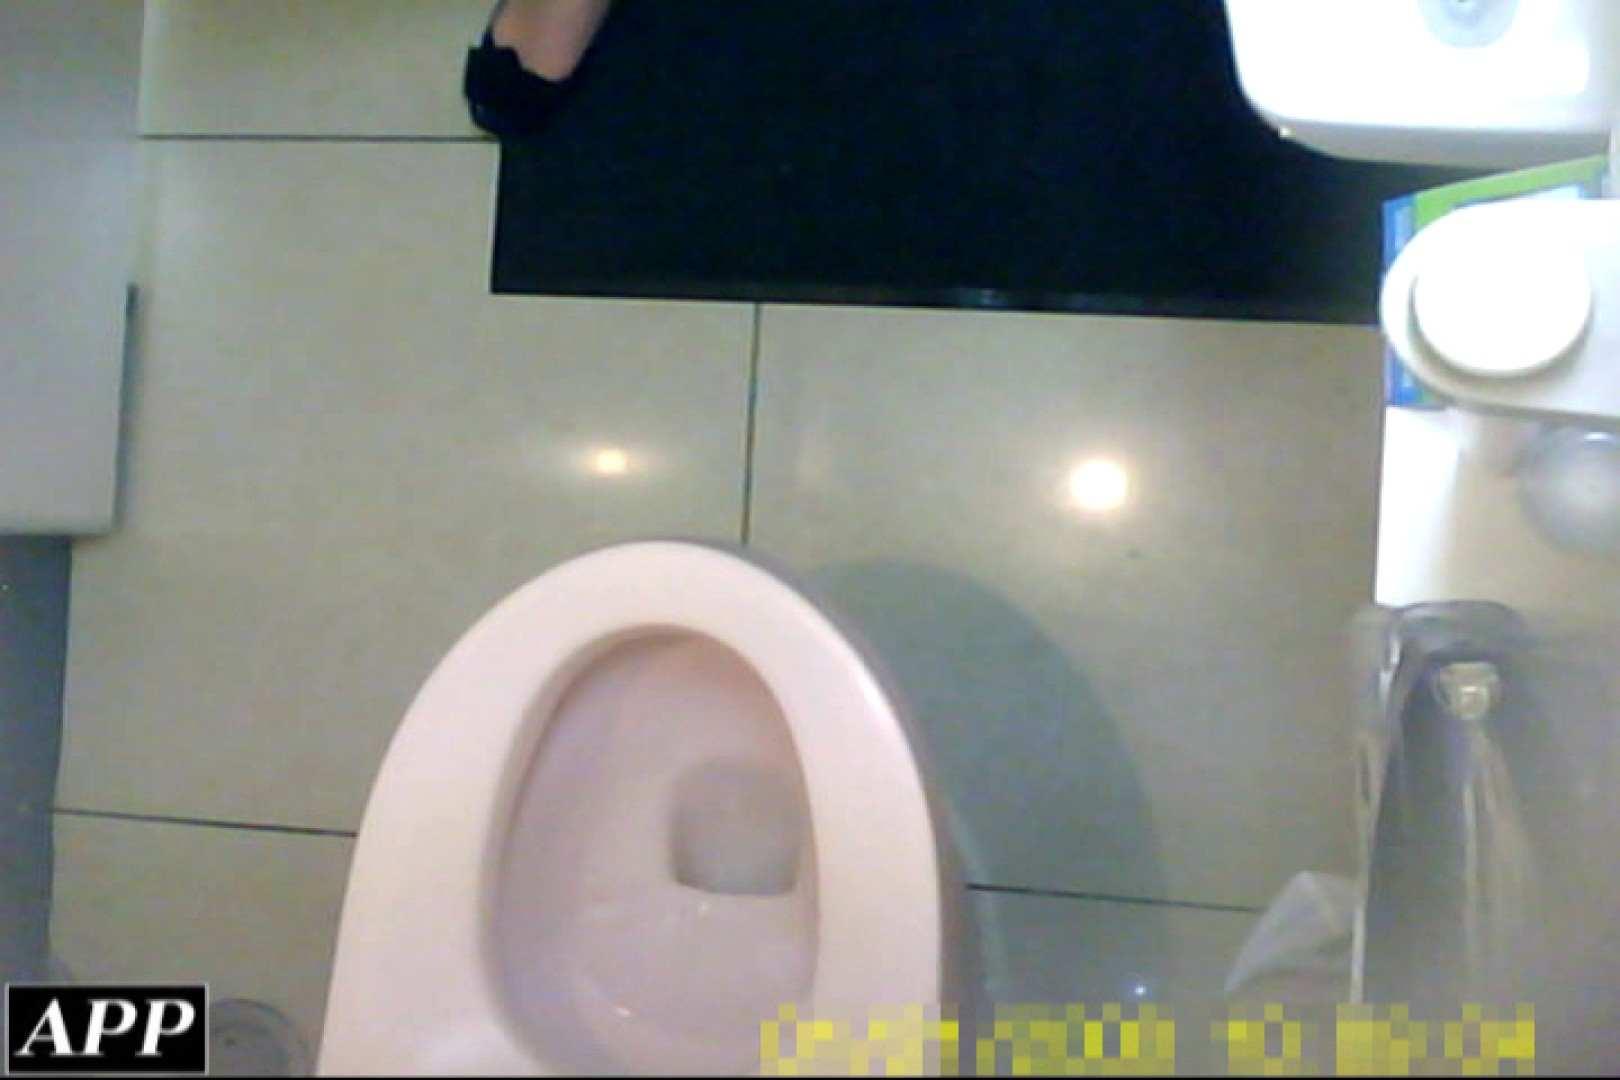 3視点洗面所 vol.095 OLセックス | 洗面所  87画像 11